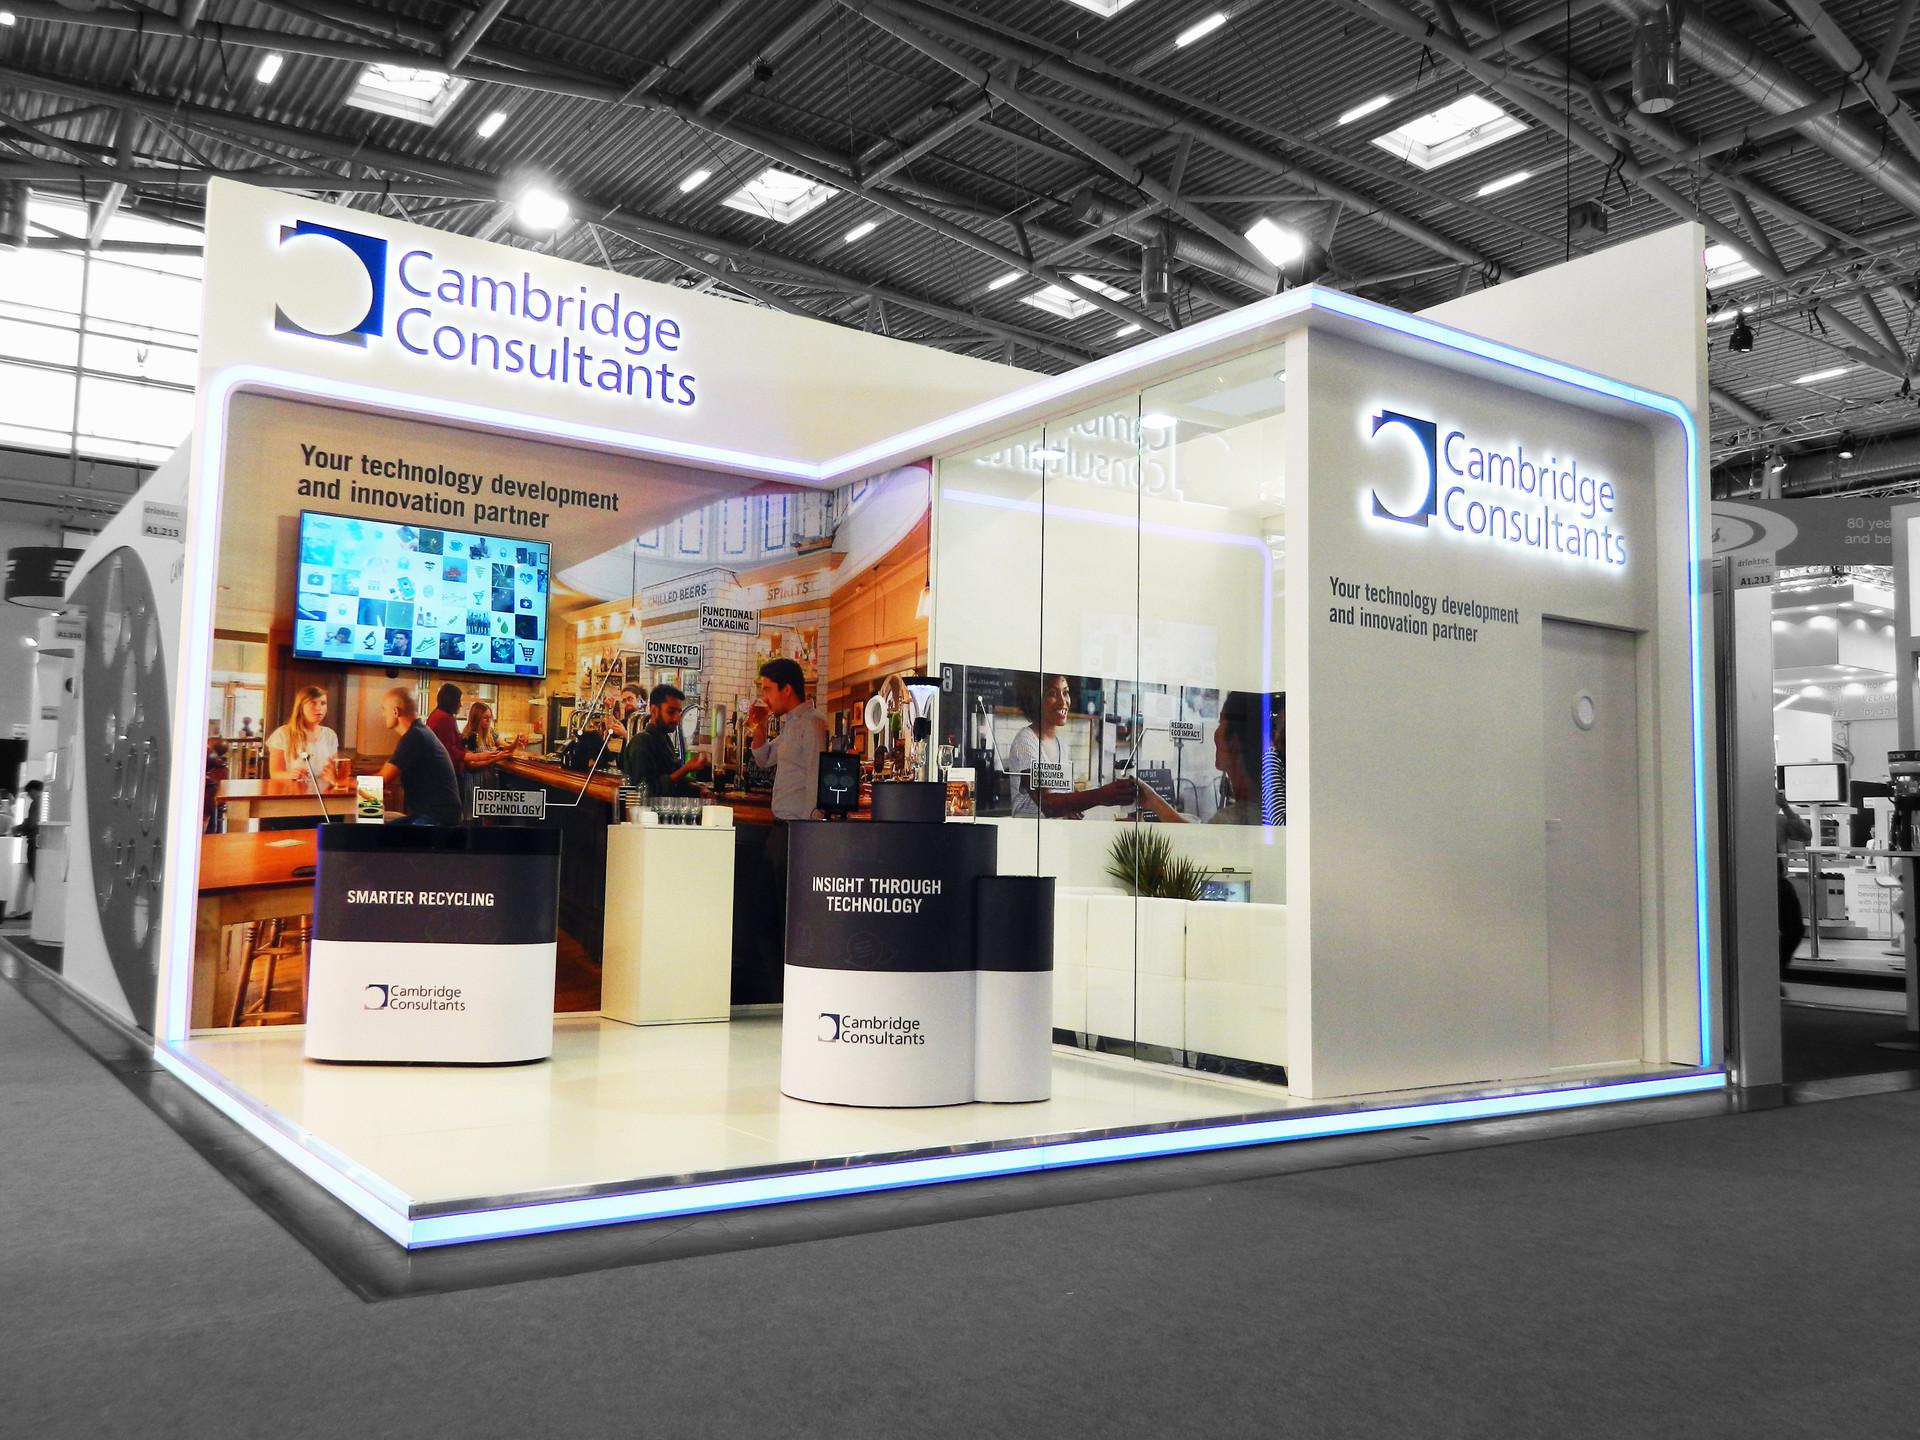 Trade Show Stand - Cambridge Consultants